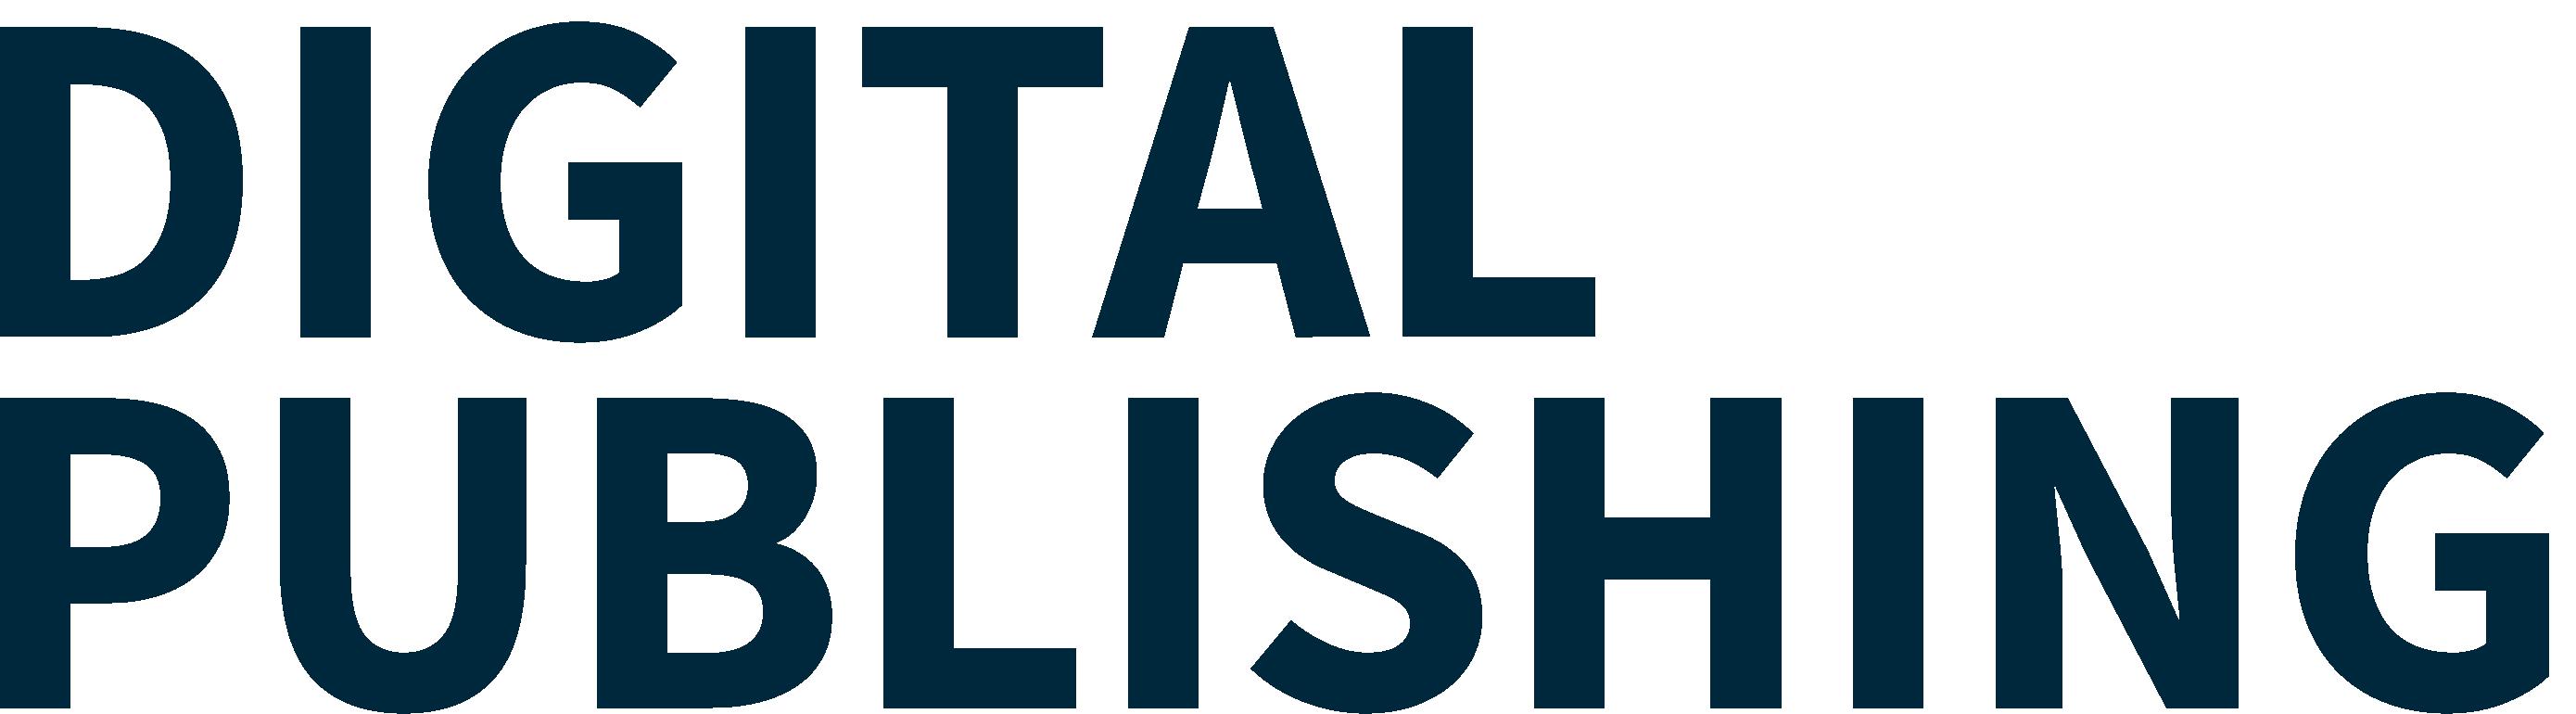 DIGITAL PUBLISHING GmbH